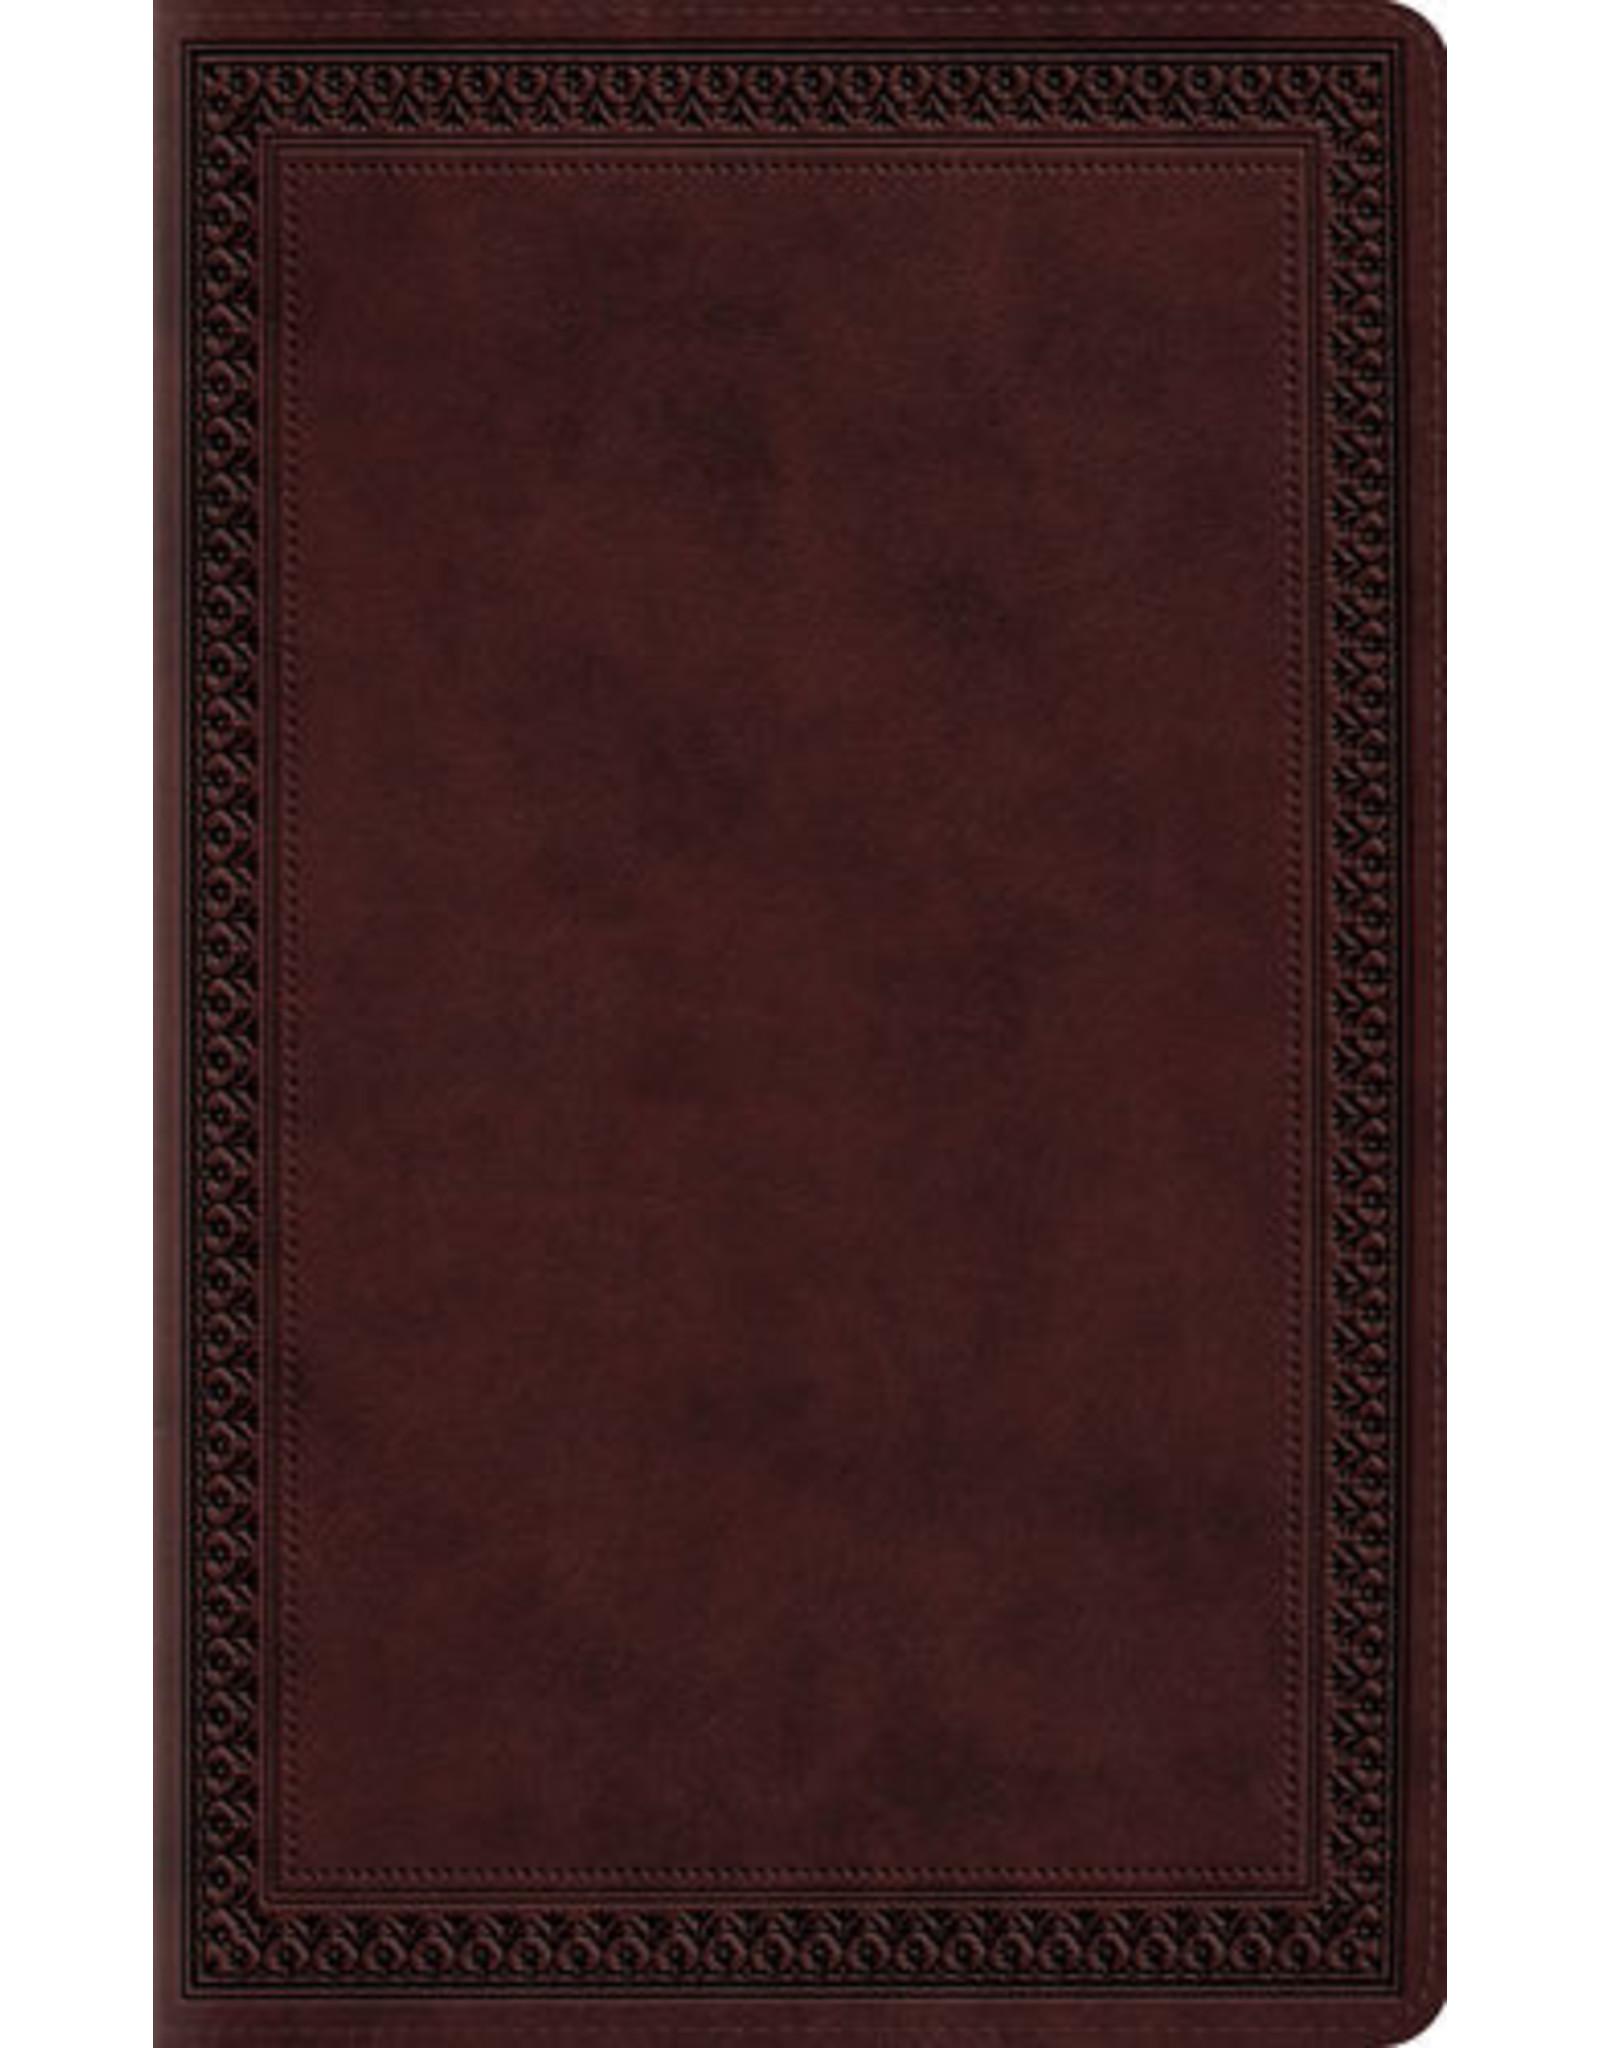 Crossway / Good News ESV Large Print Value Thinline Bible (TT Mahogan)